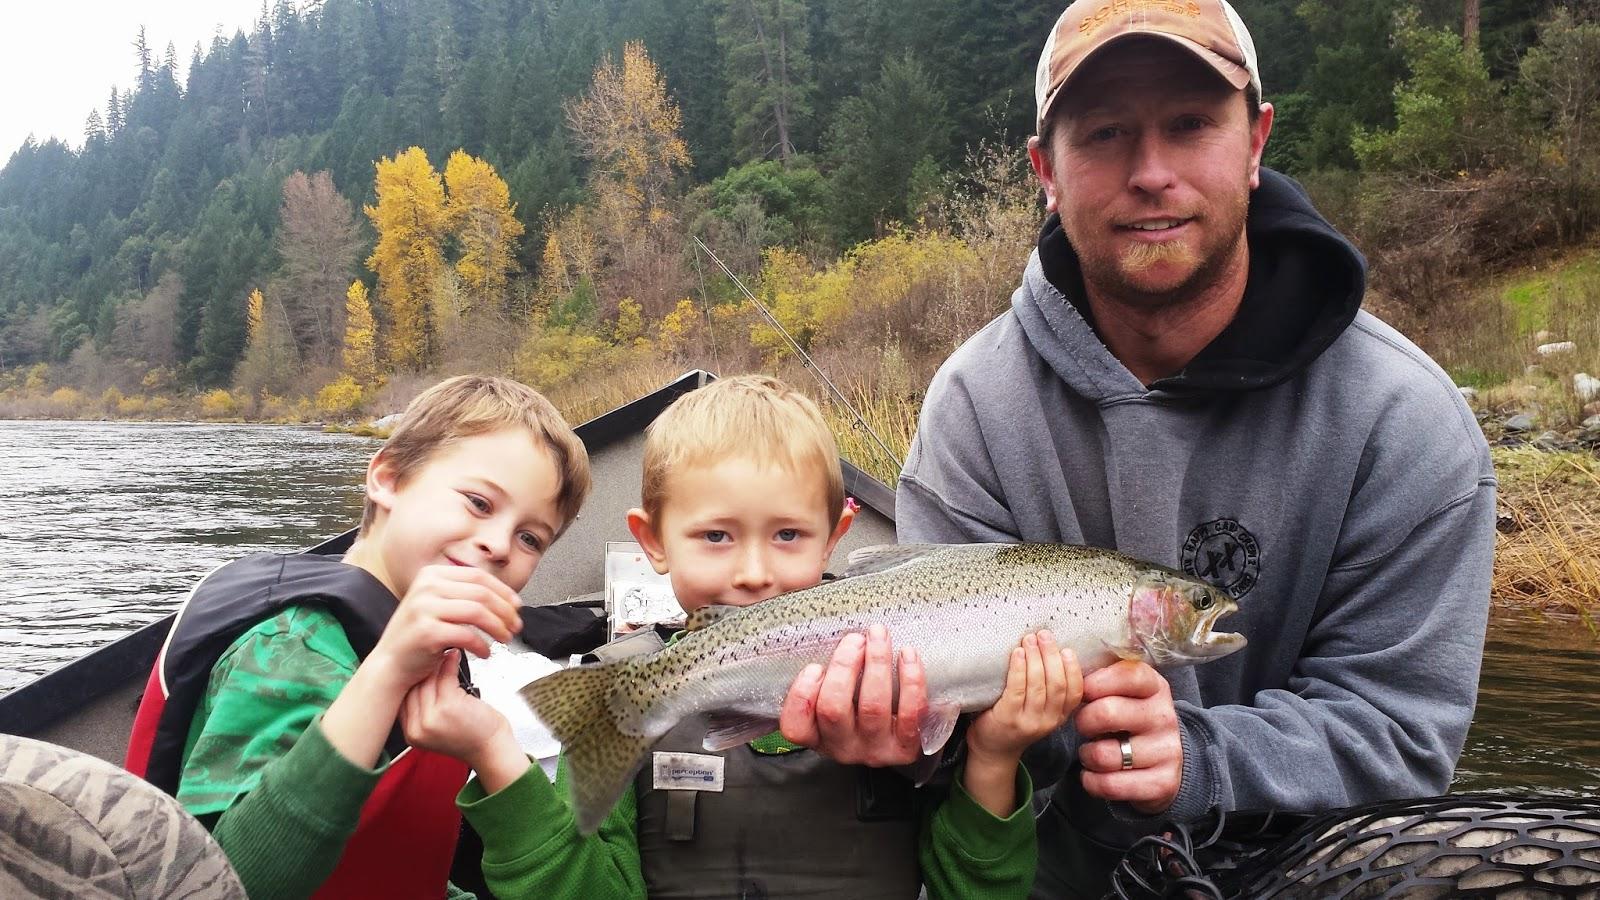 Klamath River Steelhead fishing with Ironhead Guide Service.